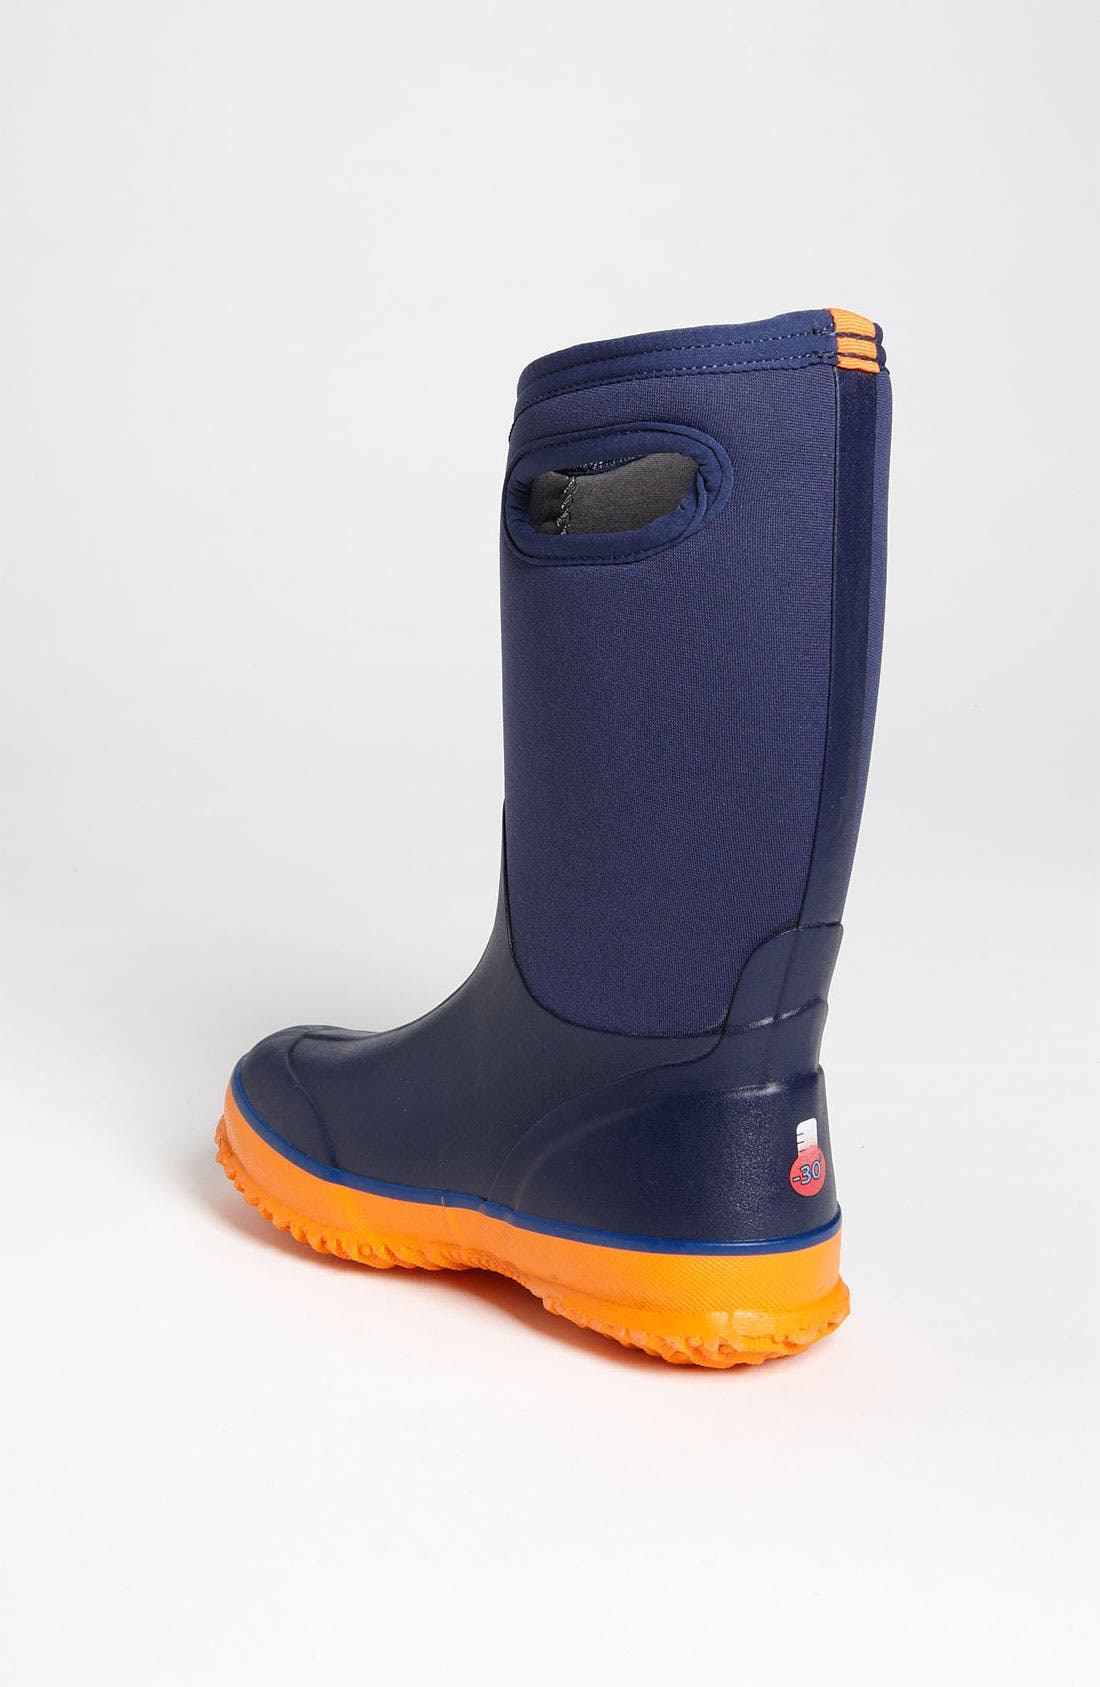 Alternate Image 2  - Bogs 'Classic High' Waterproof Boot (Toddler, Little Kid & Big Kid)